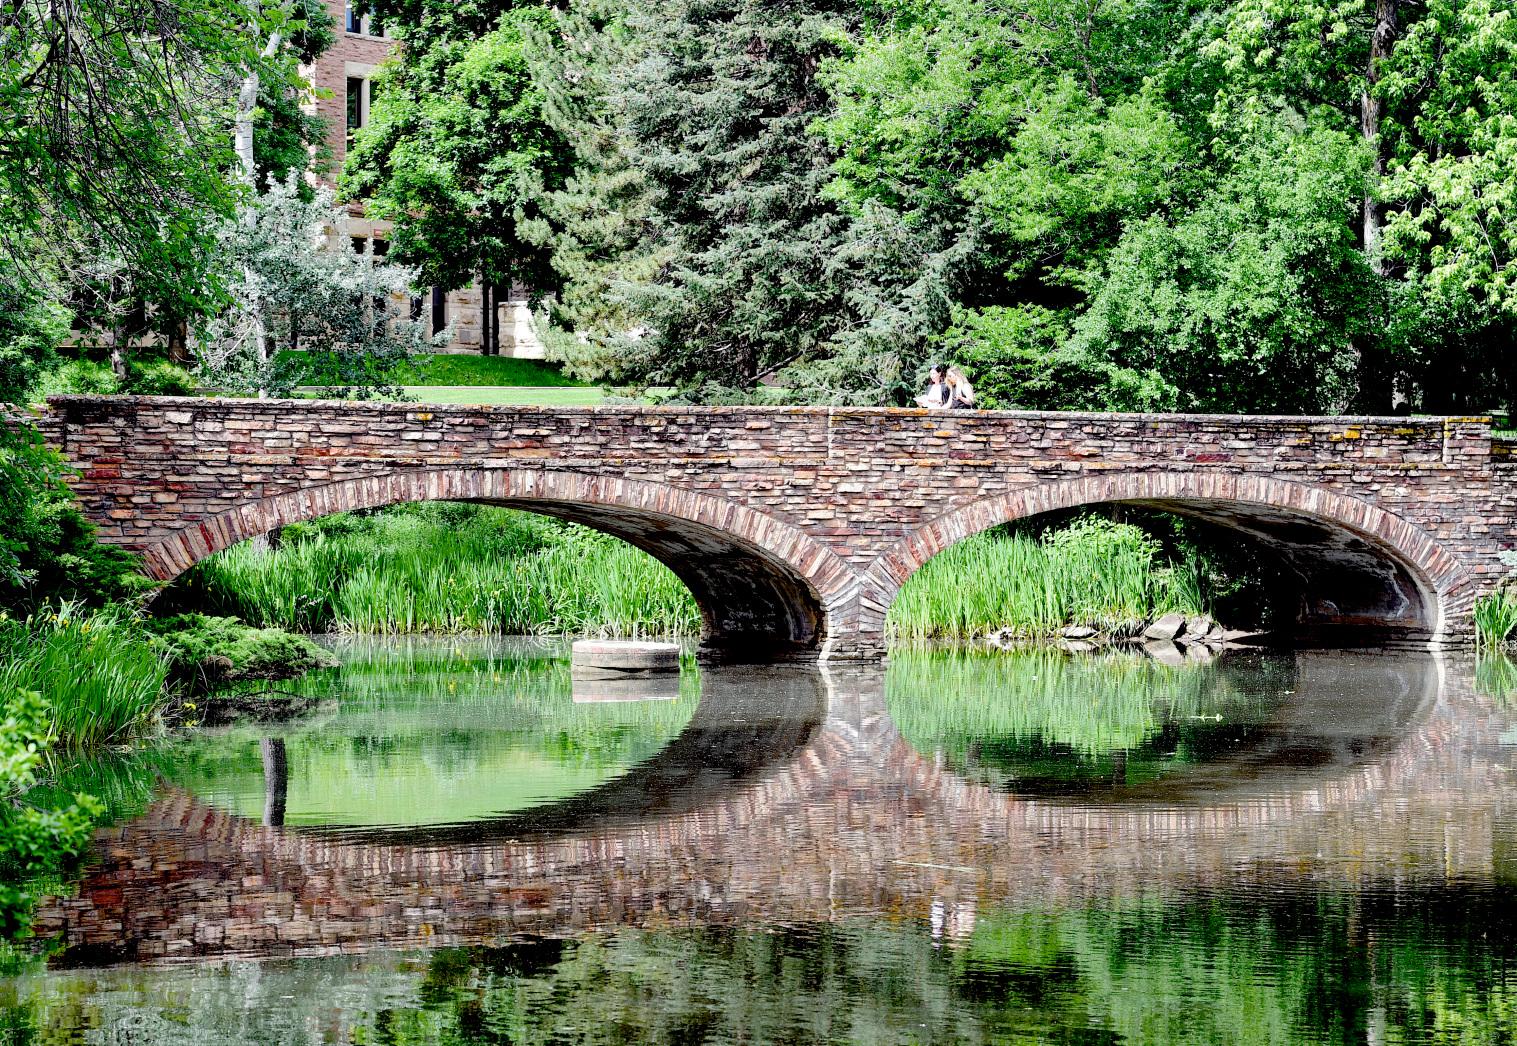 Two women cross the bridge over Varsity Pond on the University of Colorado Boulder campus on June 27, 2019.